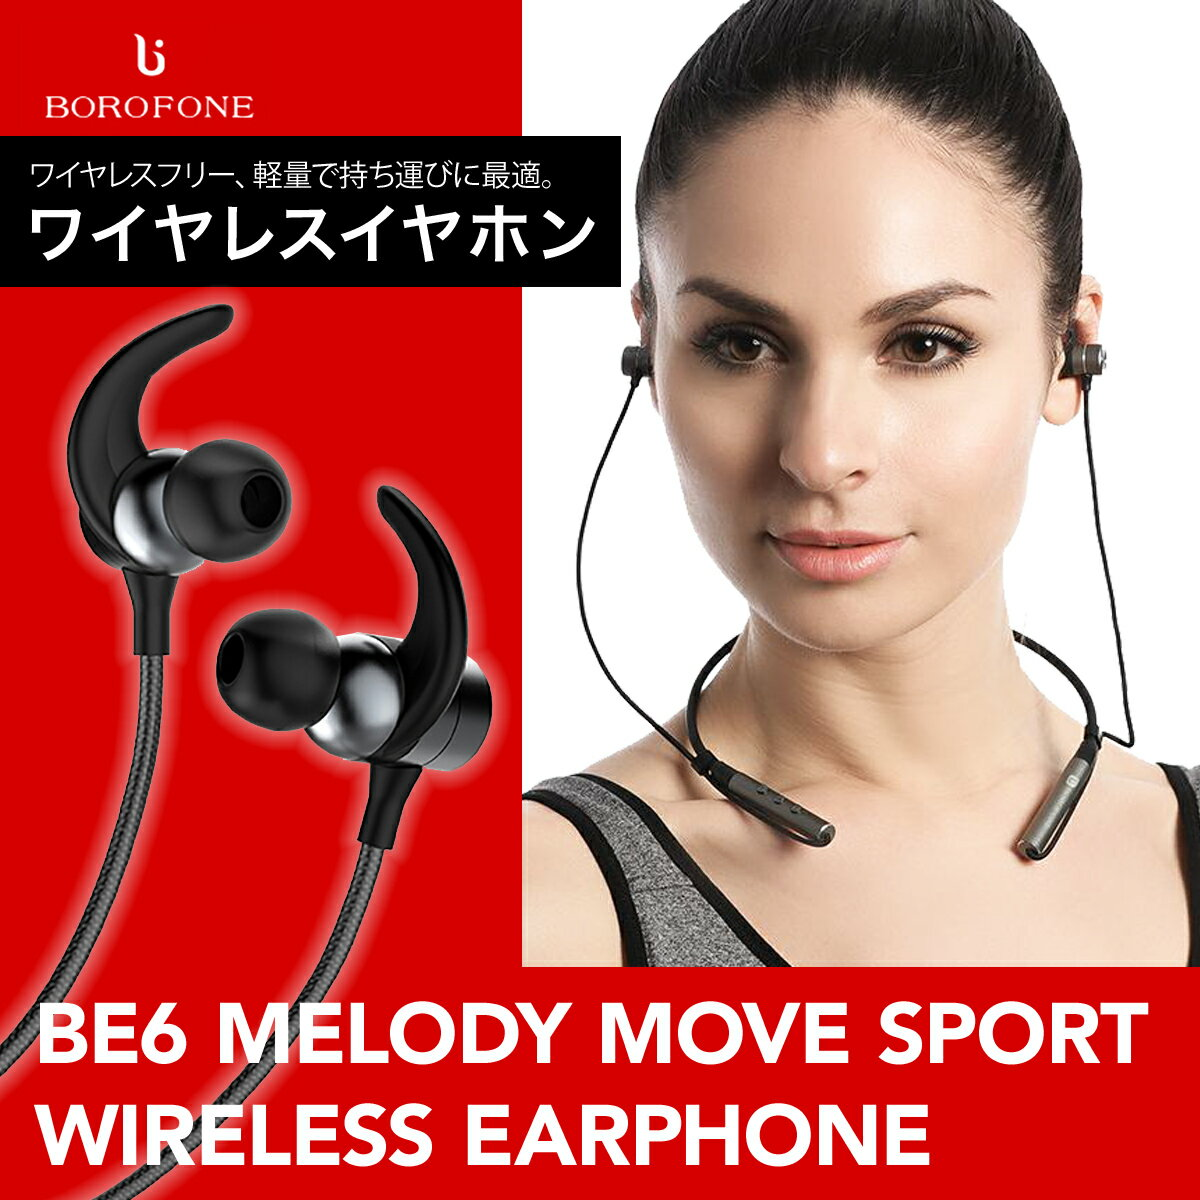 Bluetooth ワイヤレスイヤホン スポーツイヤホン ヘッドセット イヤホンマイク ハンズフリーヘッドセットワイヤレス イヤホン ランニング Bluetooth 送料無料 ボロフォン BOROFONE borofone-be6